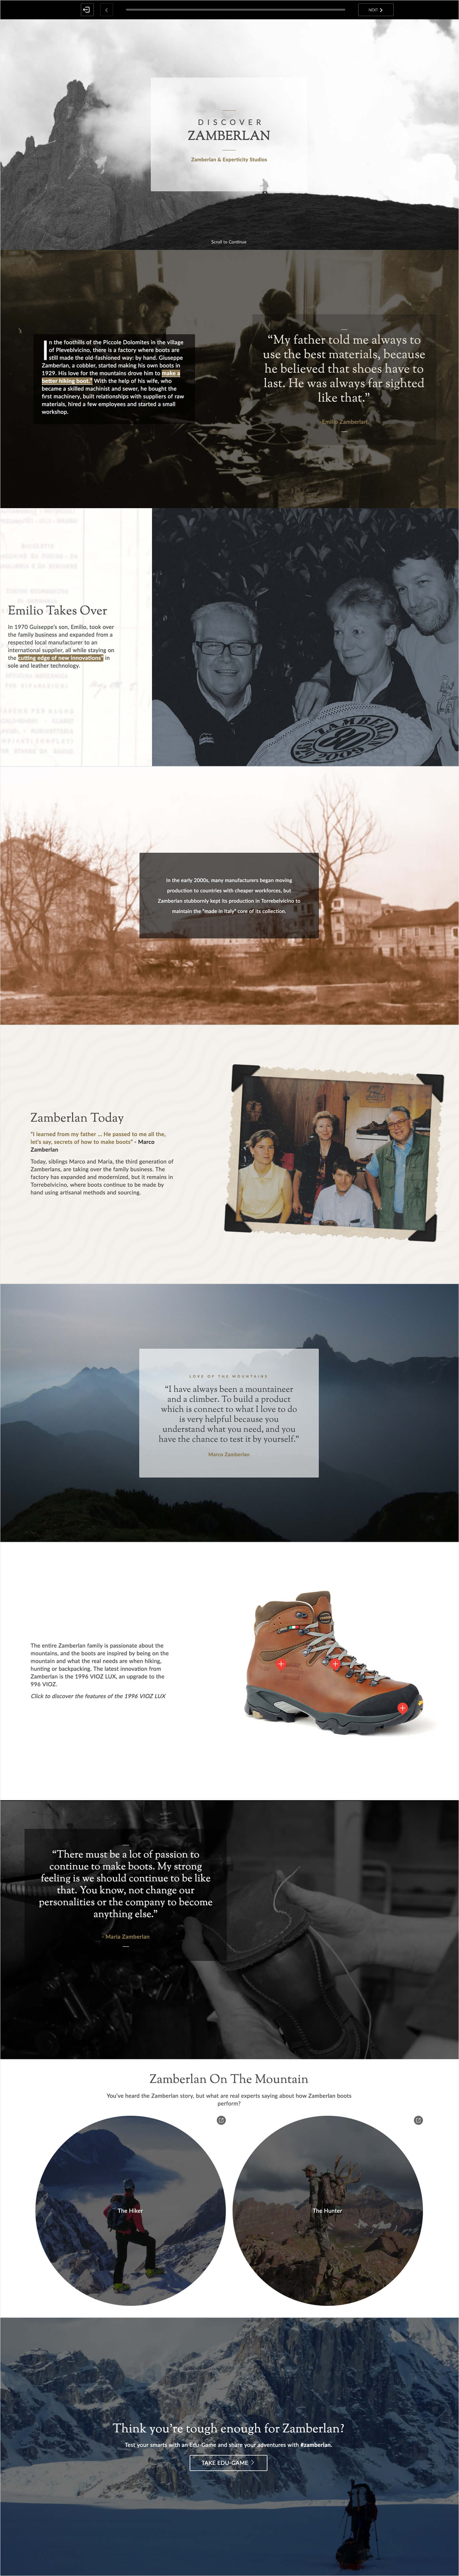 Zamberlan eLearning campaign design